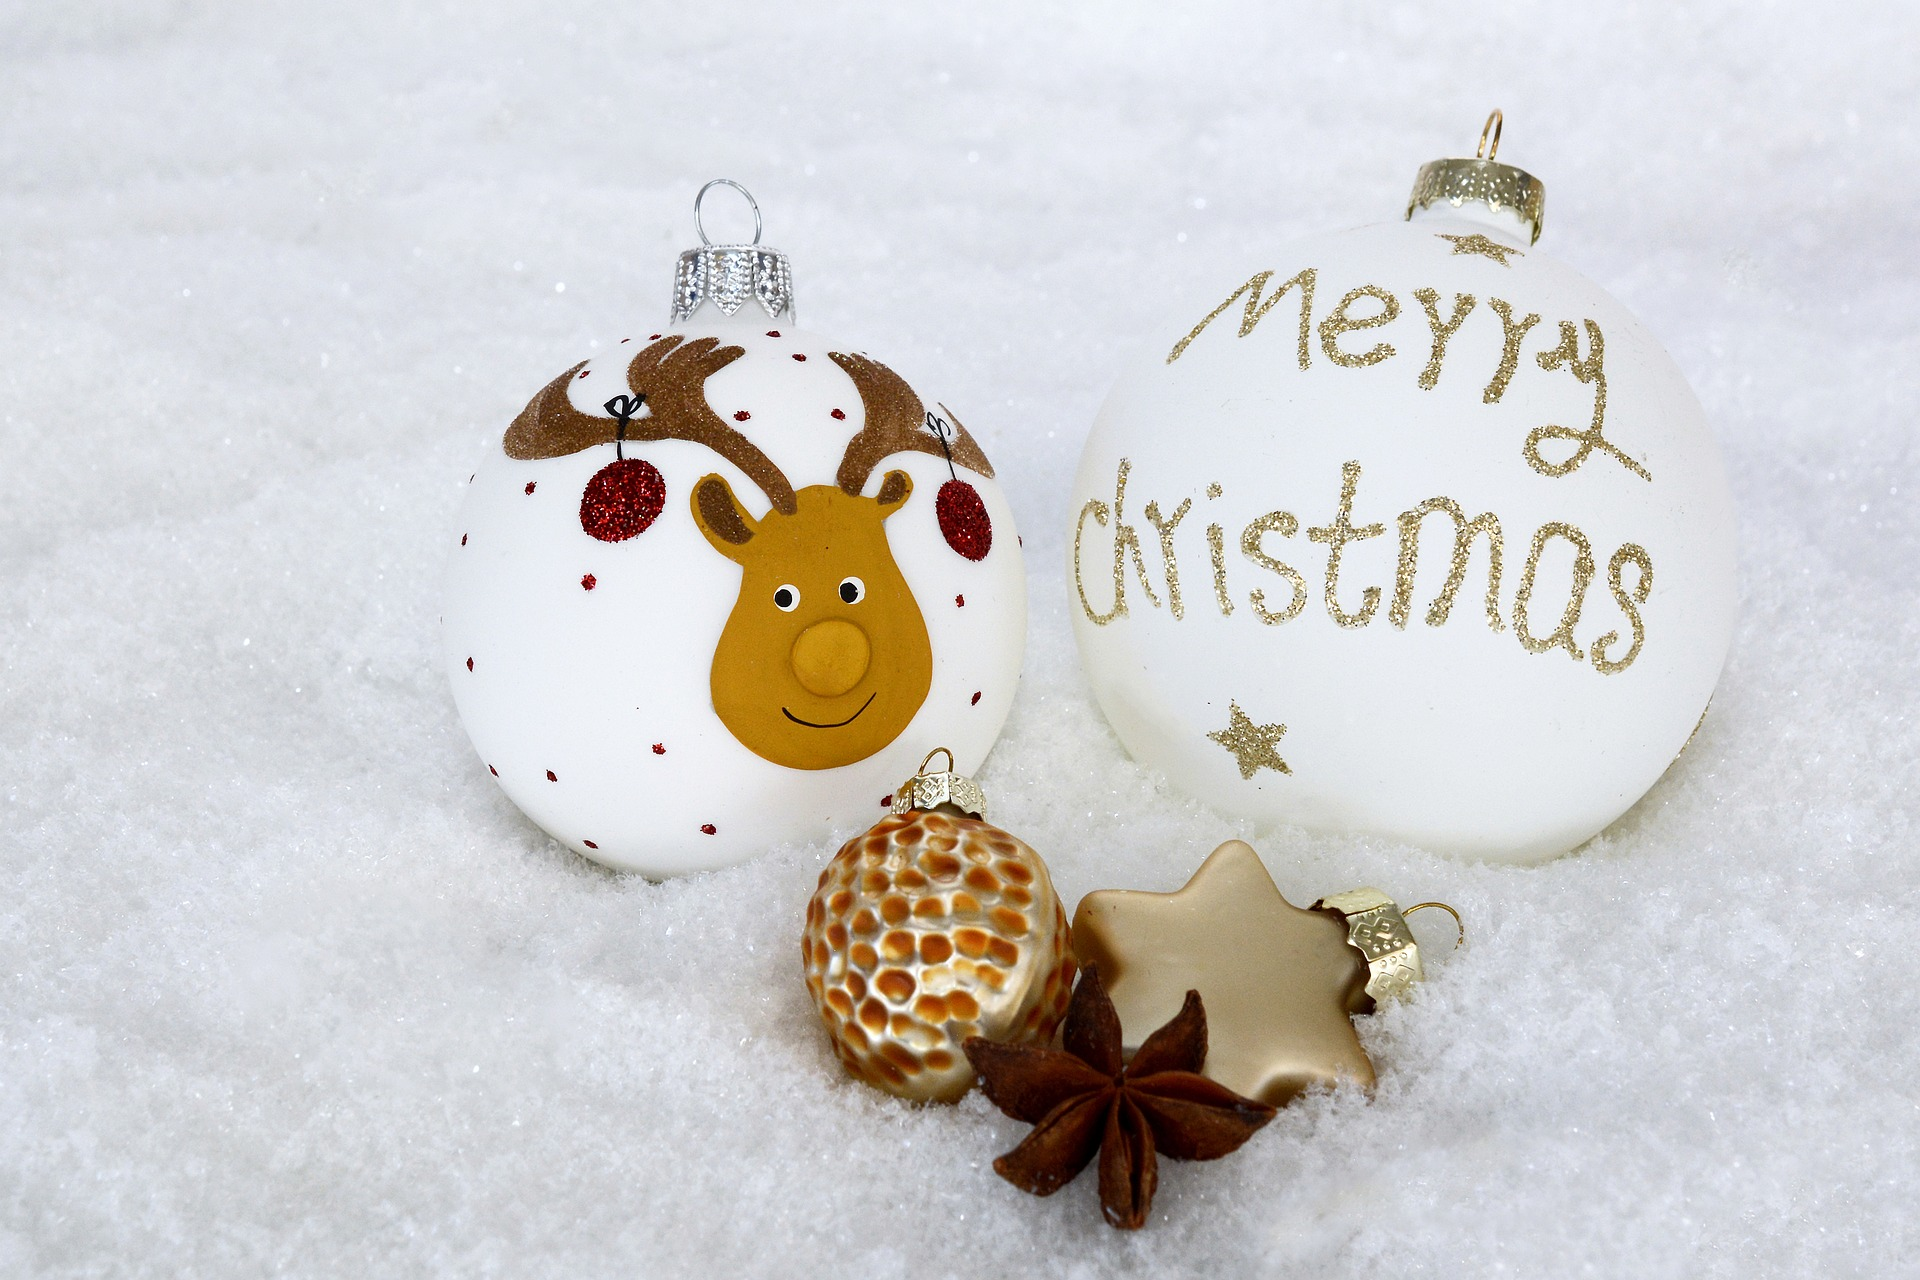 christmas-bauble-2956232_1920